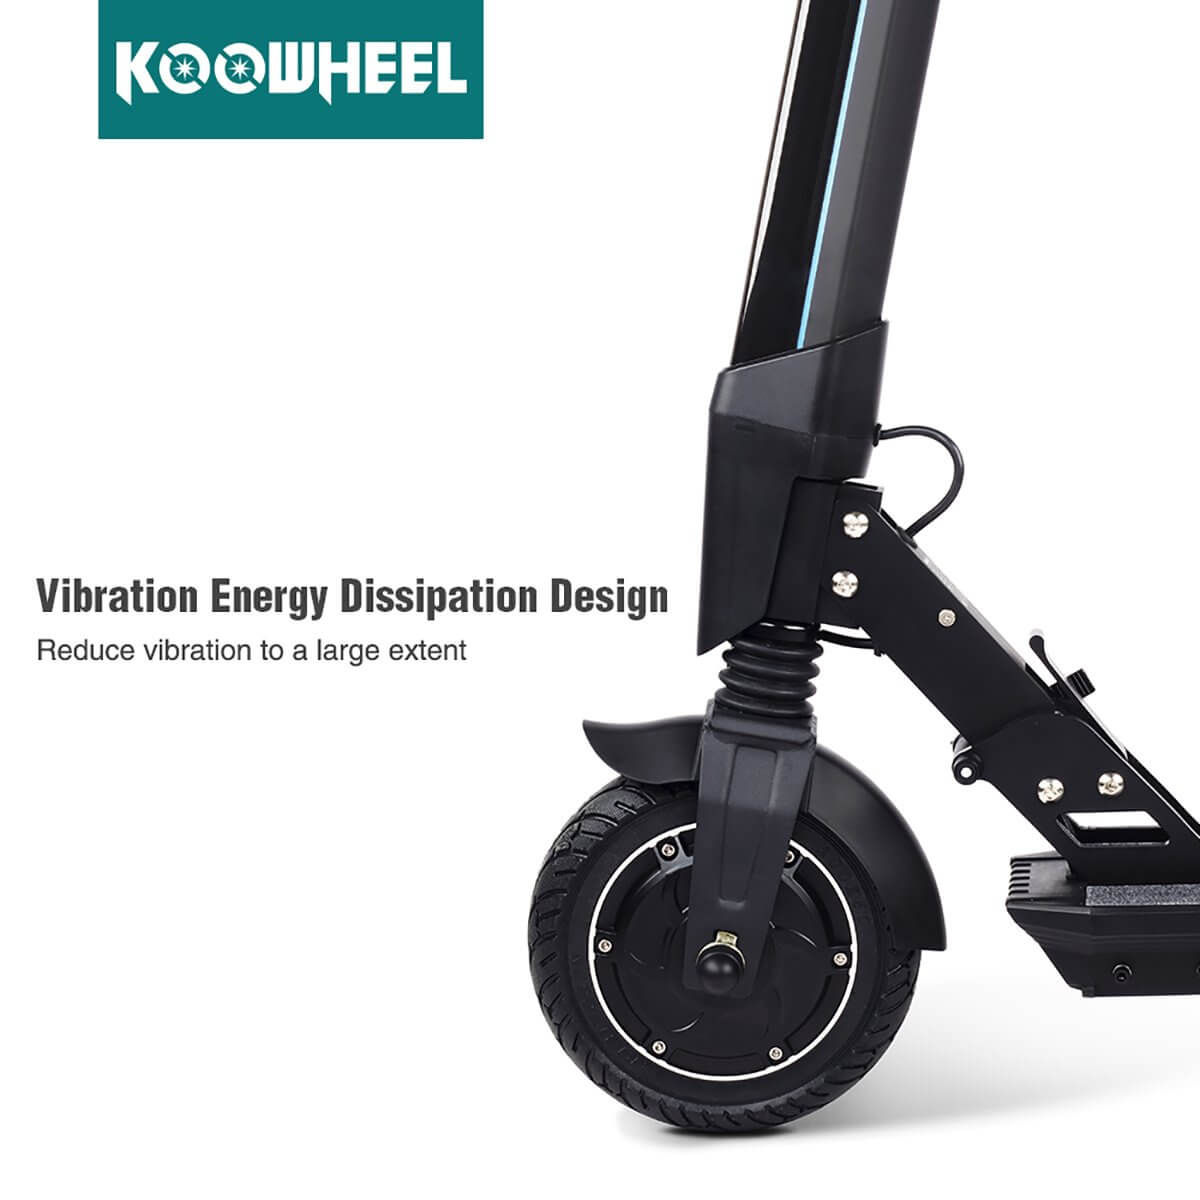 Koowheel L8 electric scooter